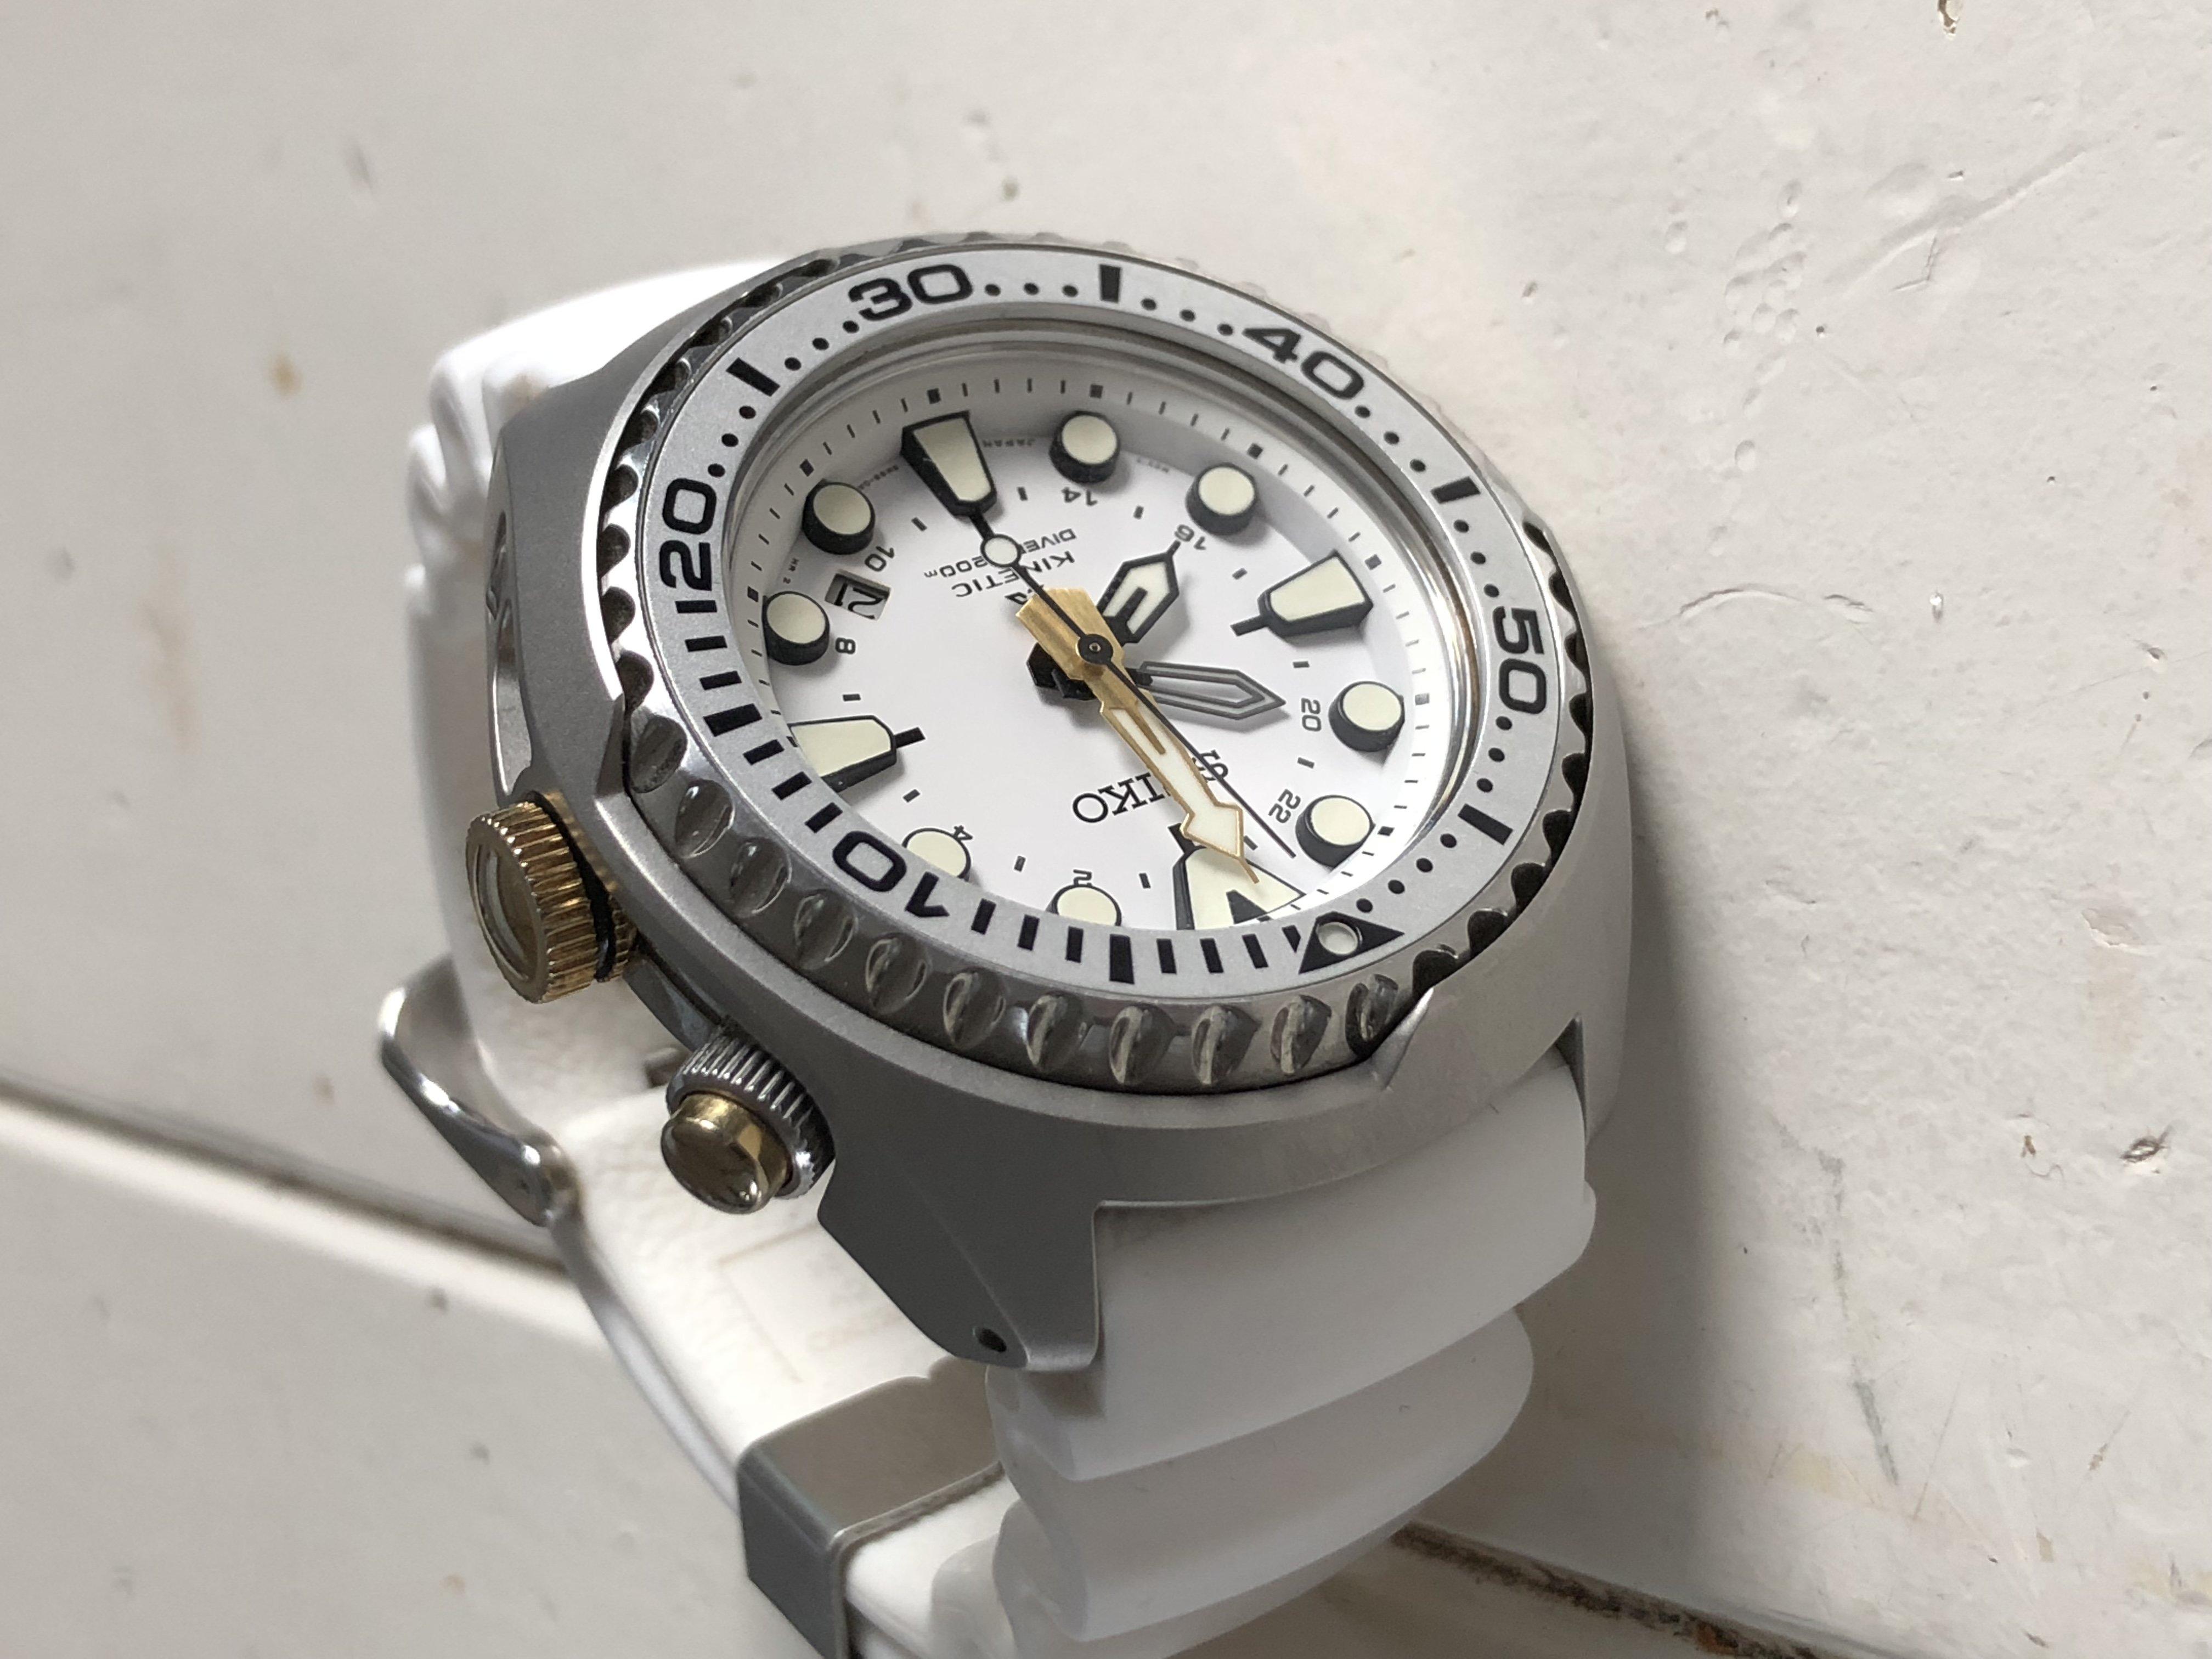 Sold Seiko Sun043 Prospex Gmt Kinetic Full Set Horlogemarktnl Ce627a4e 40a0 4ec1 B8ee 66ba9fb77339jpeg3024x4032 154 Mb